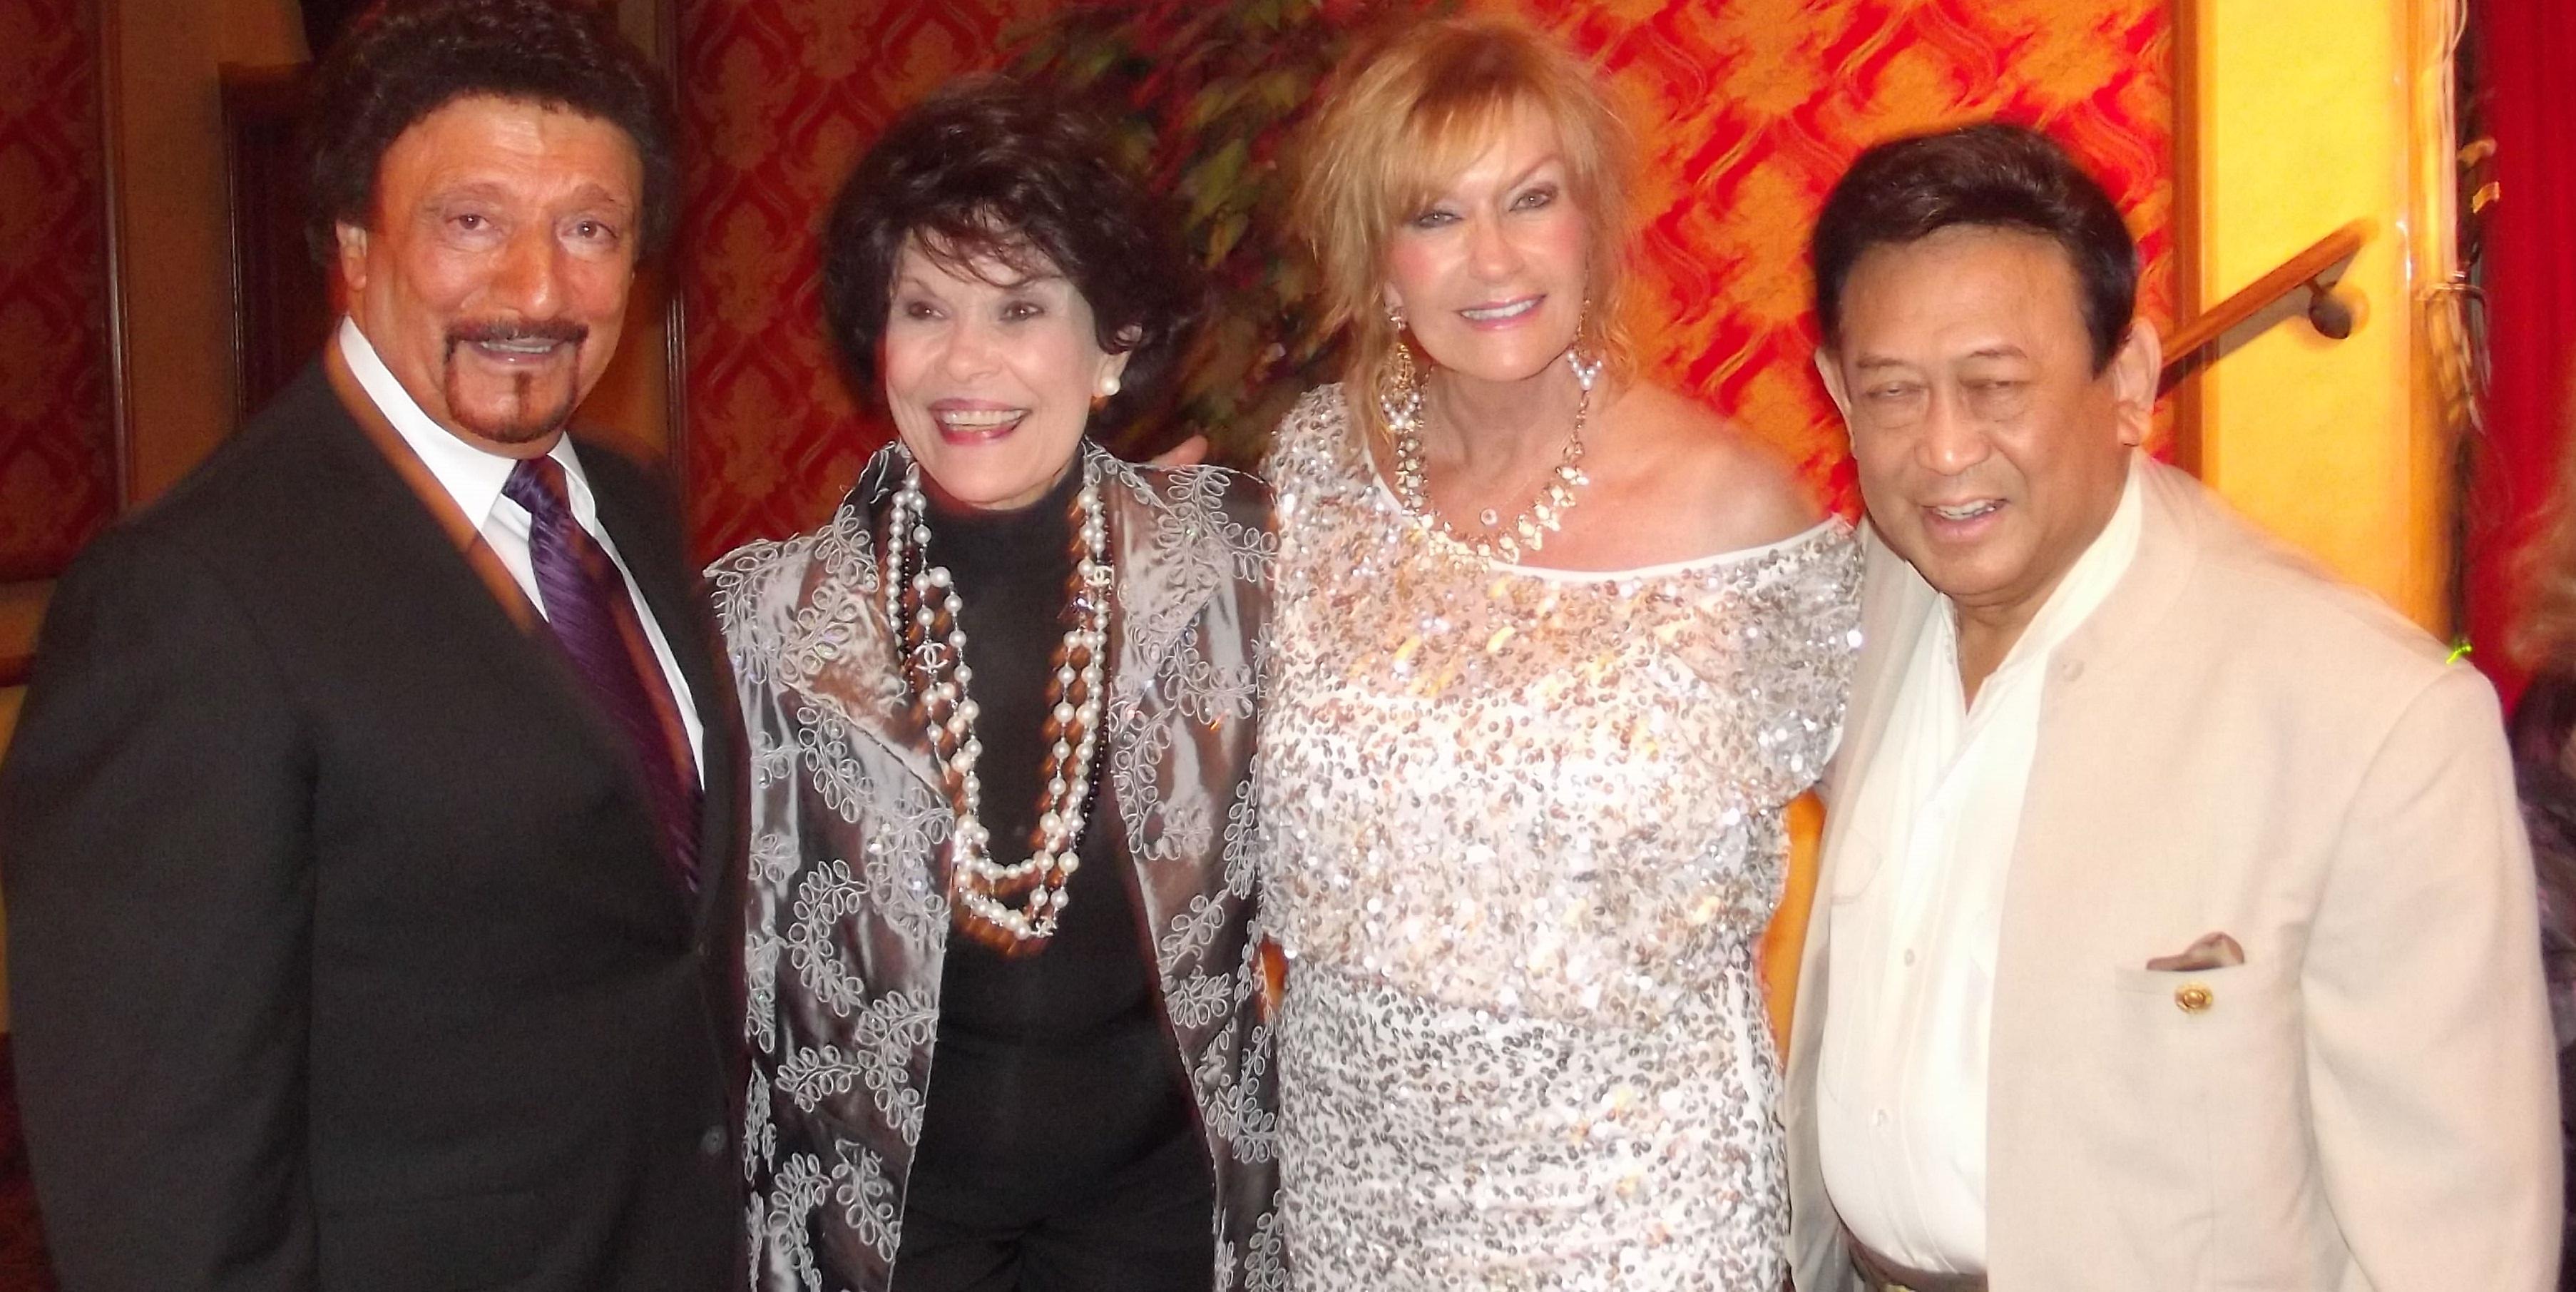 Dondino, Karen Ruivivar, Demetra George (Grammy Nominee) Tony Ruivivar (Society